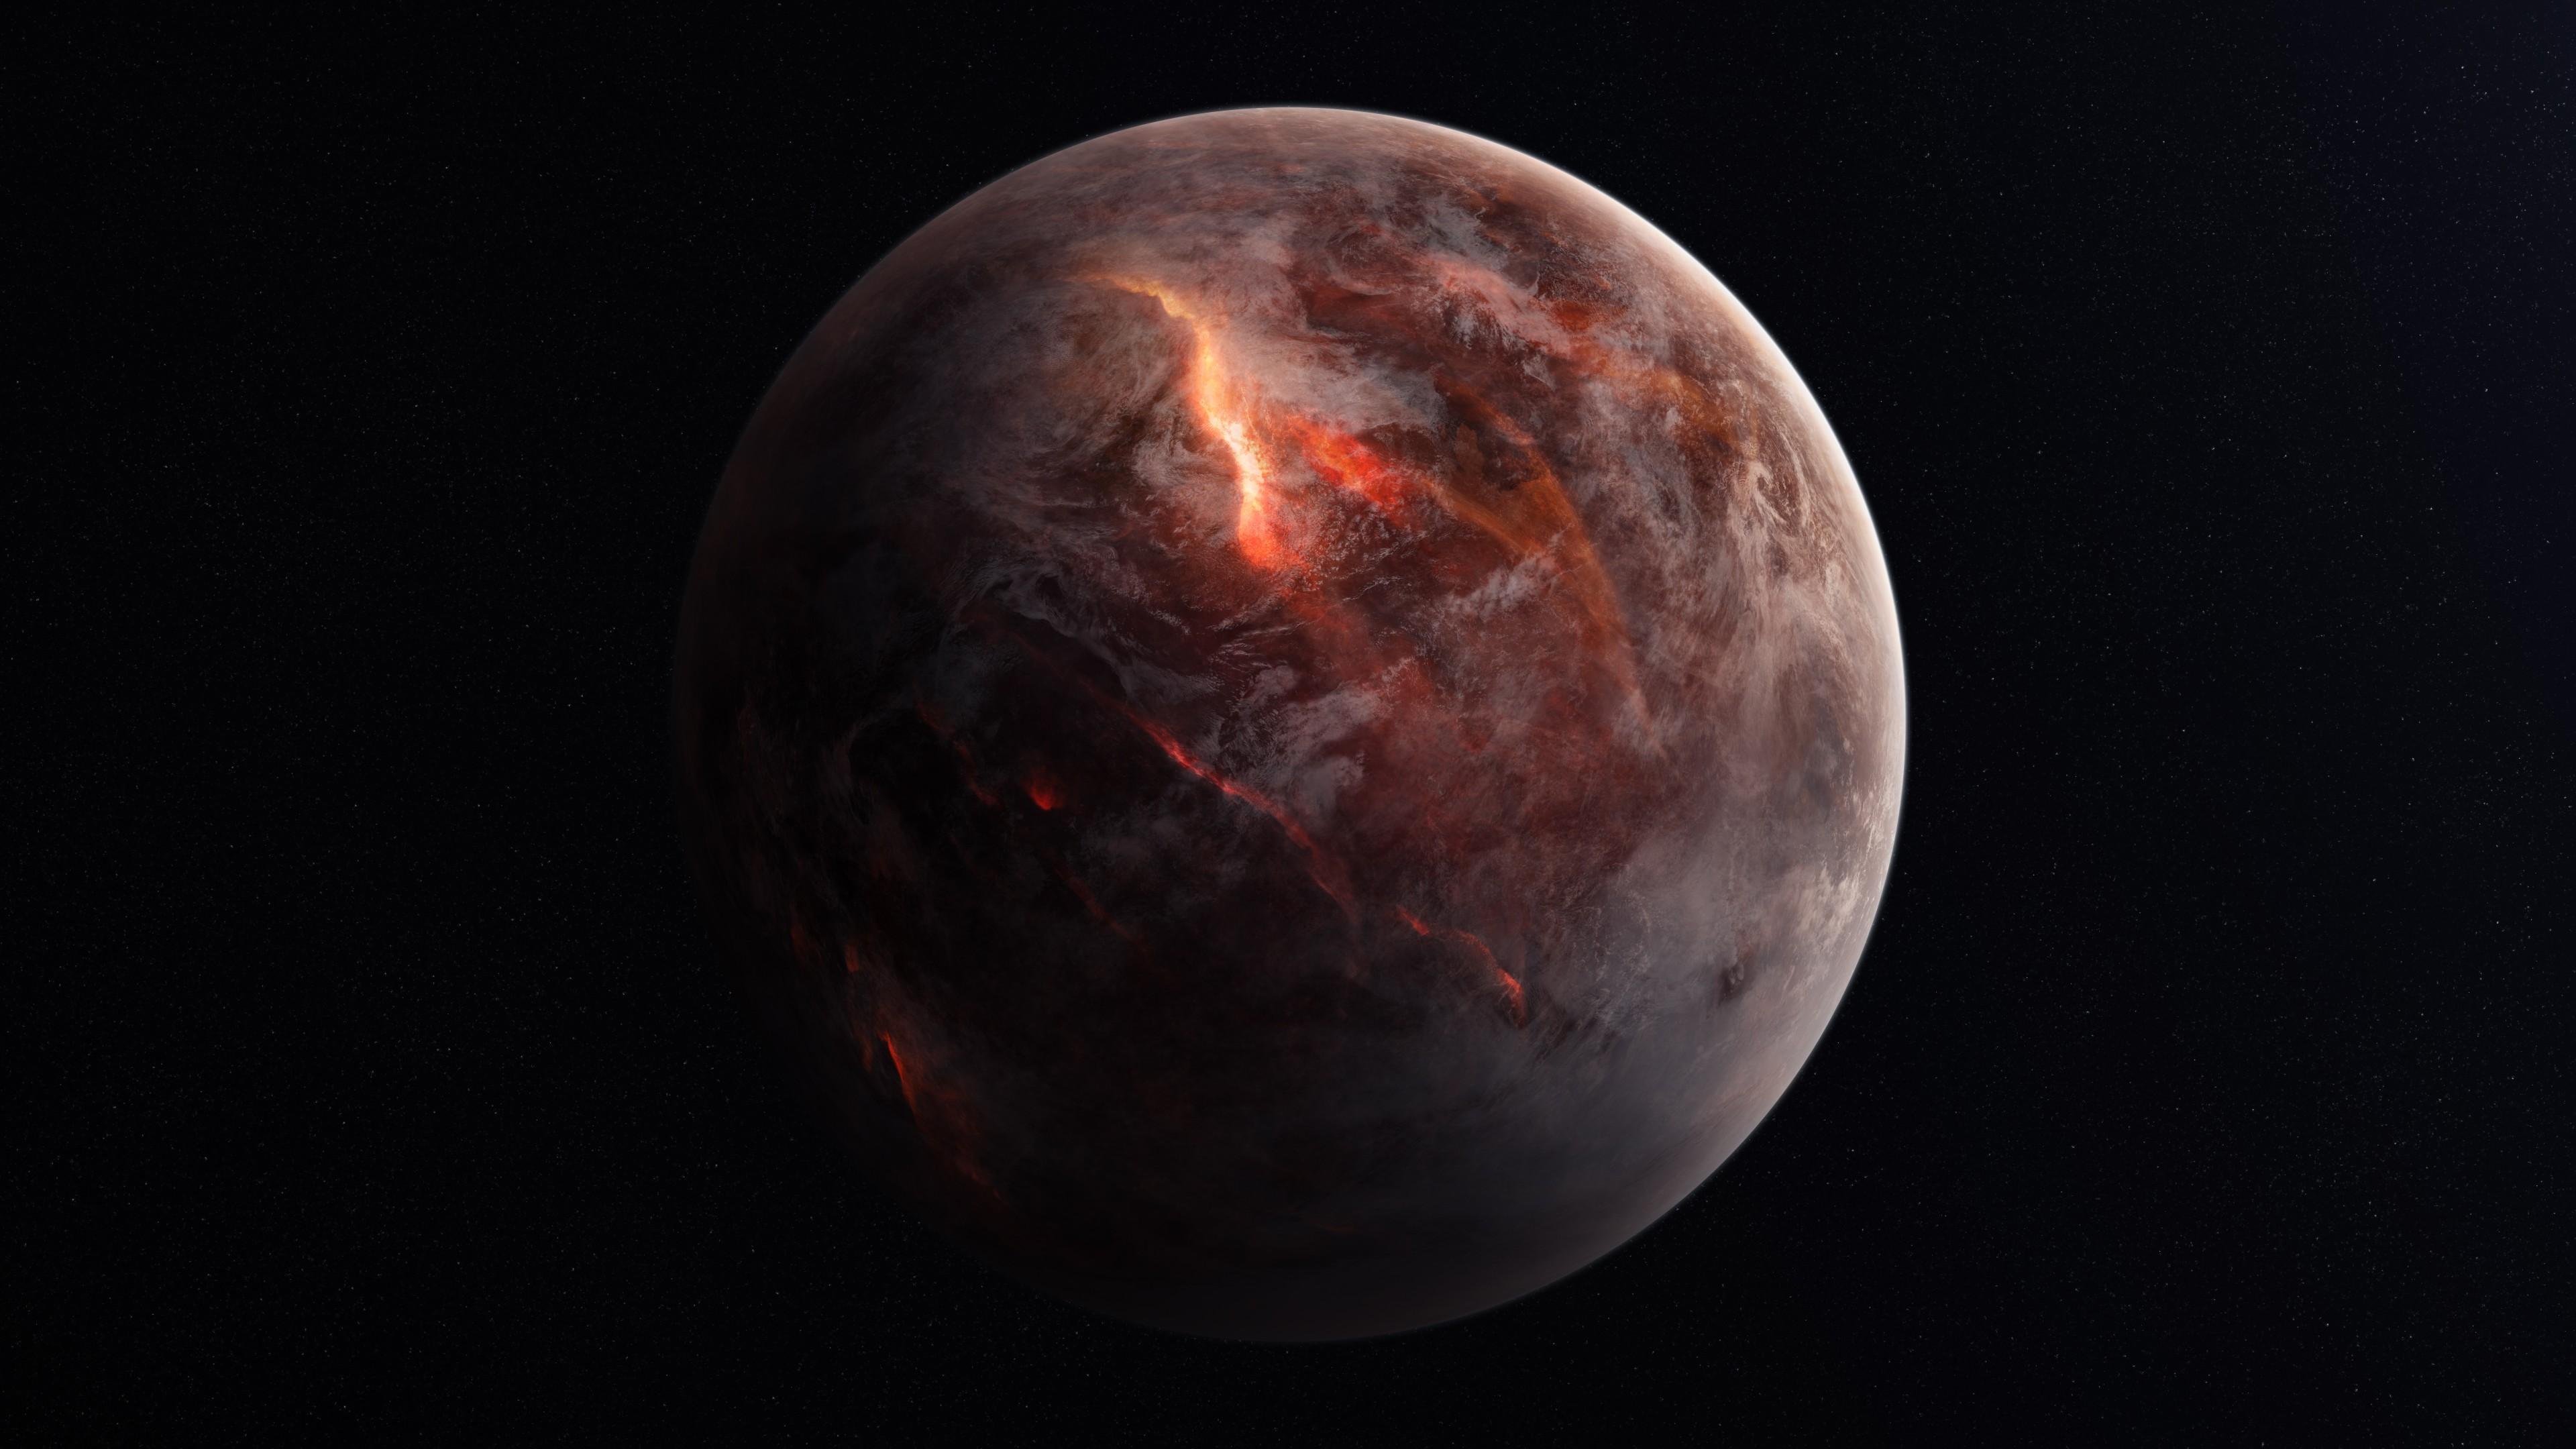 General 3840x2160 planet space space art digital art